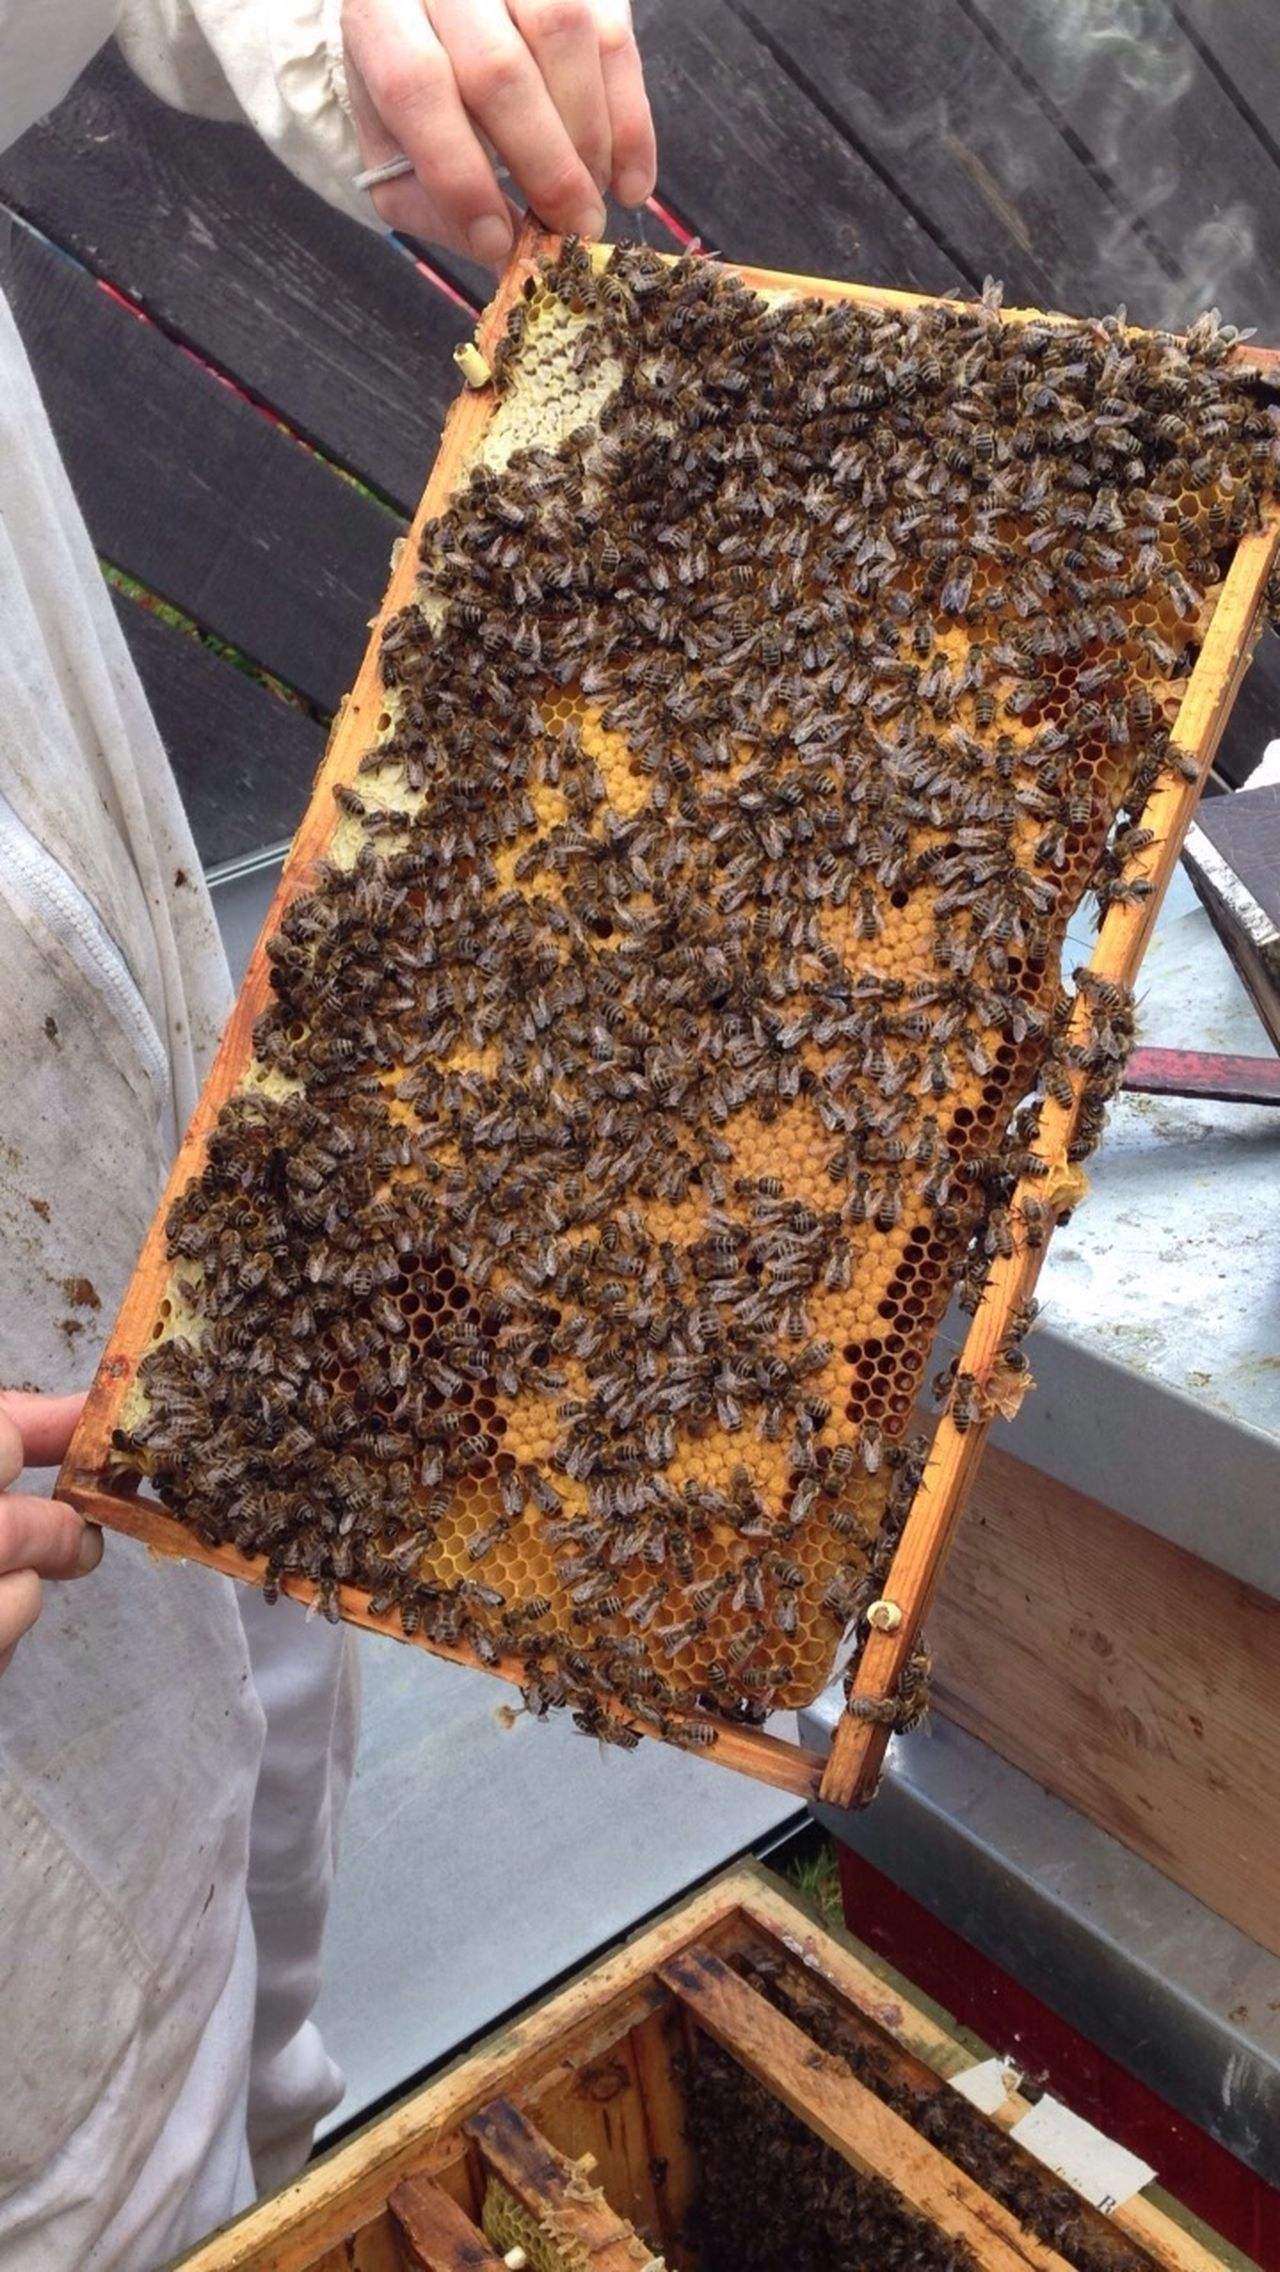 APIculture Bee Honeycomb Broodframe Beehive Beekeeper Colony Beekeeping Pollination Honey Abeille Miel